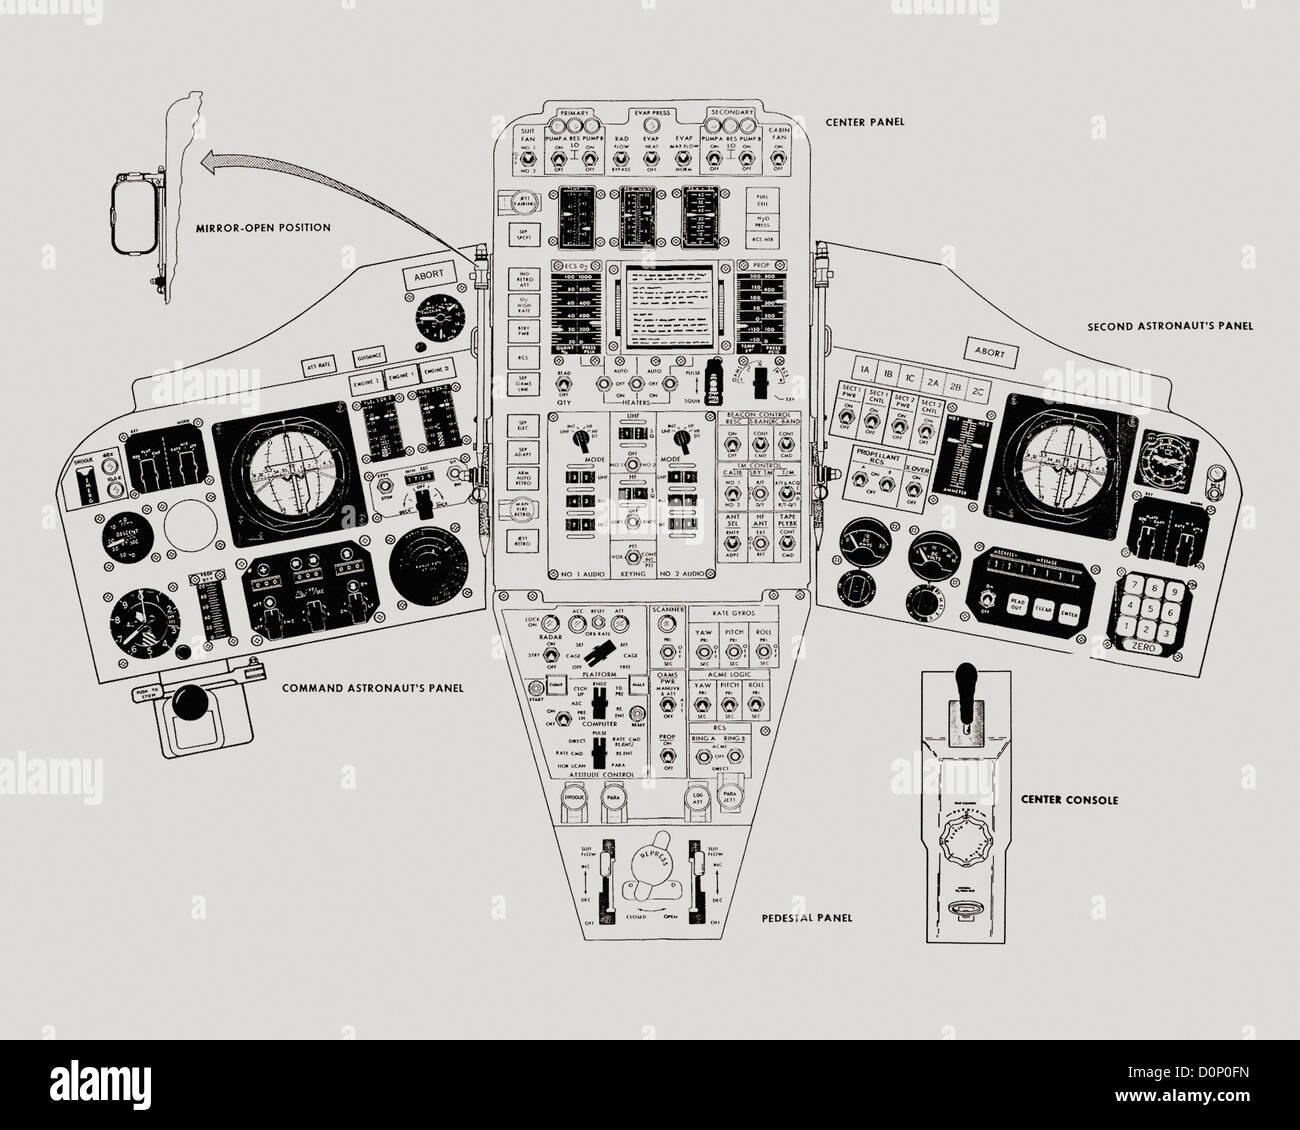 Gemini Instrument Panels and Controls - Stock Image